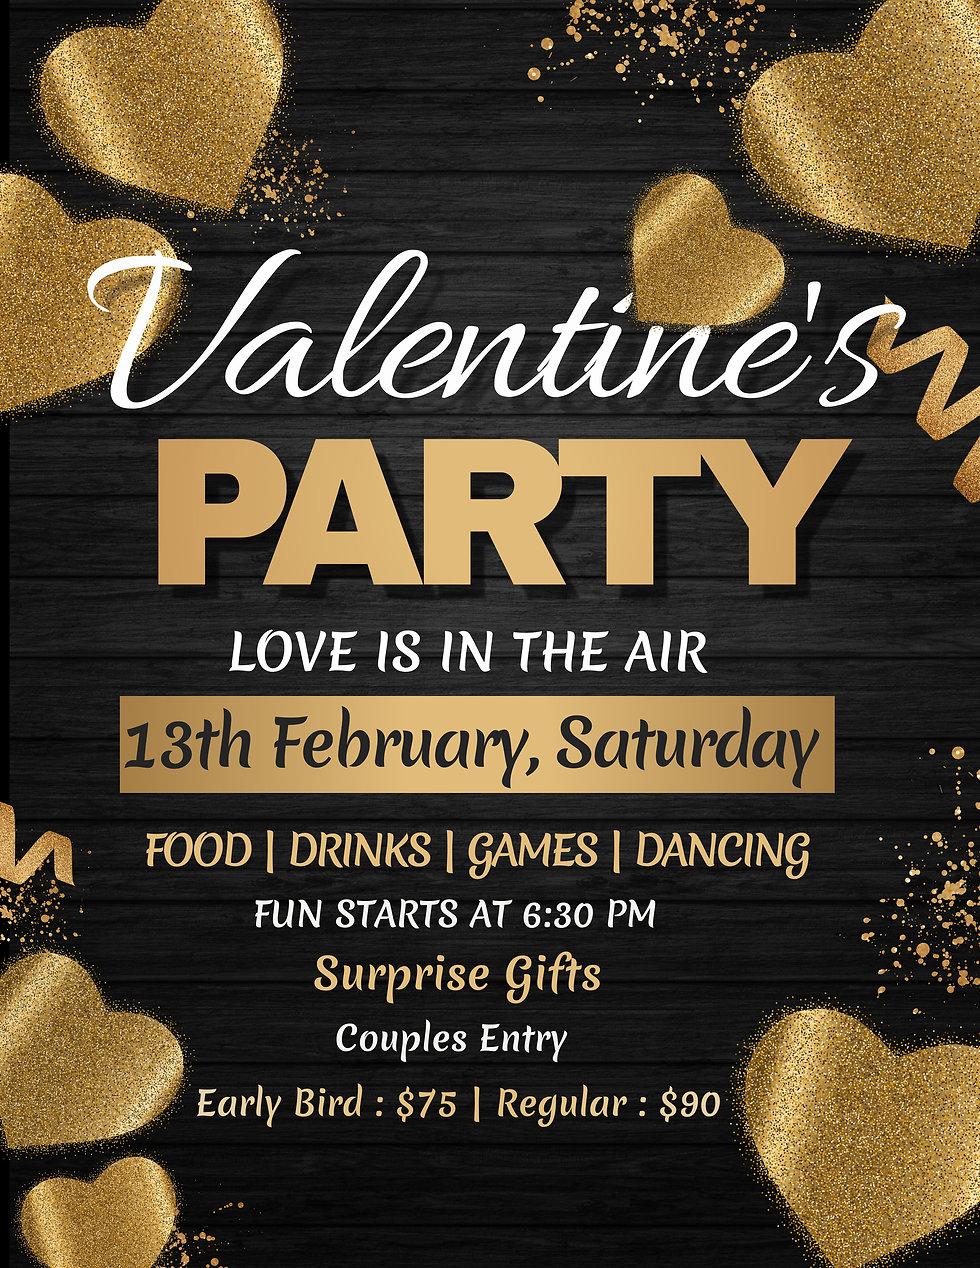 FCM_ValentineDay_Website.jpg